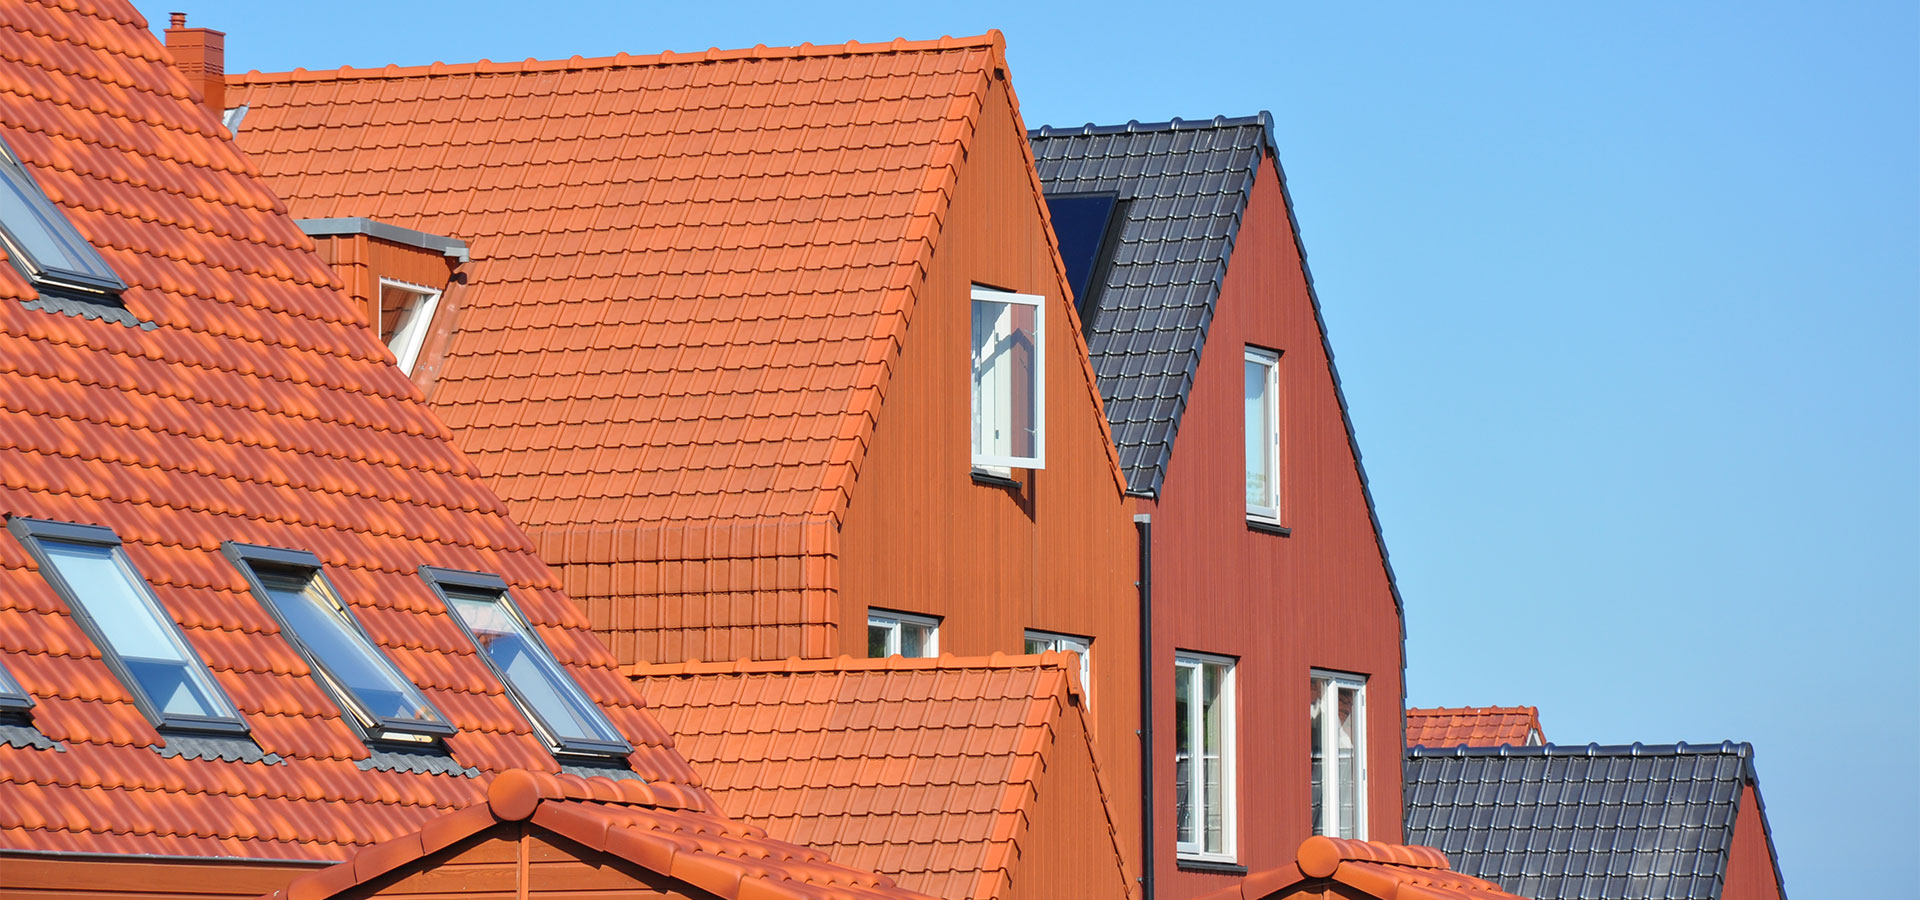 FARO architecten Twuyverhoek Sint Pancras 08